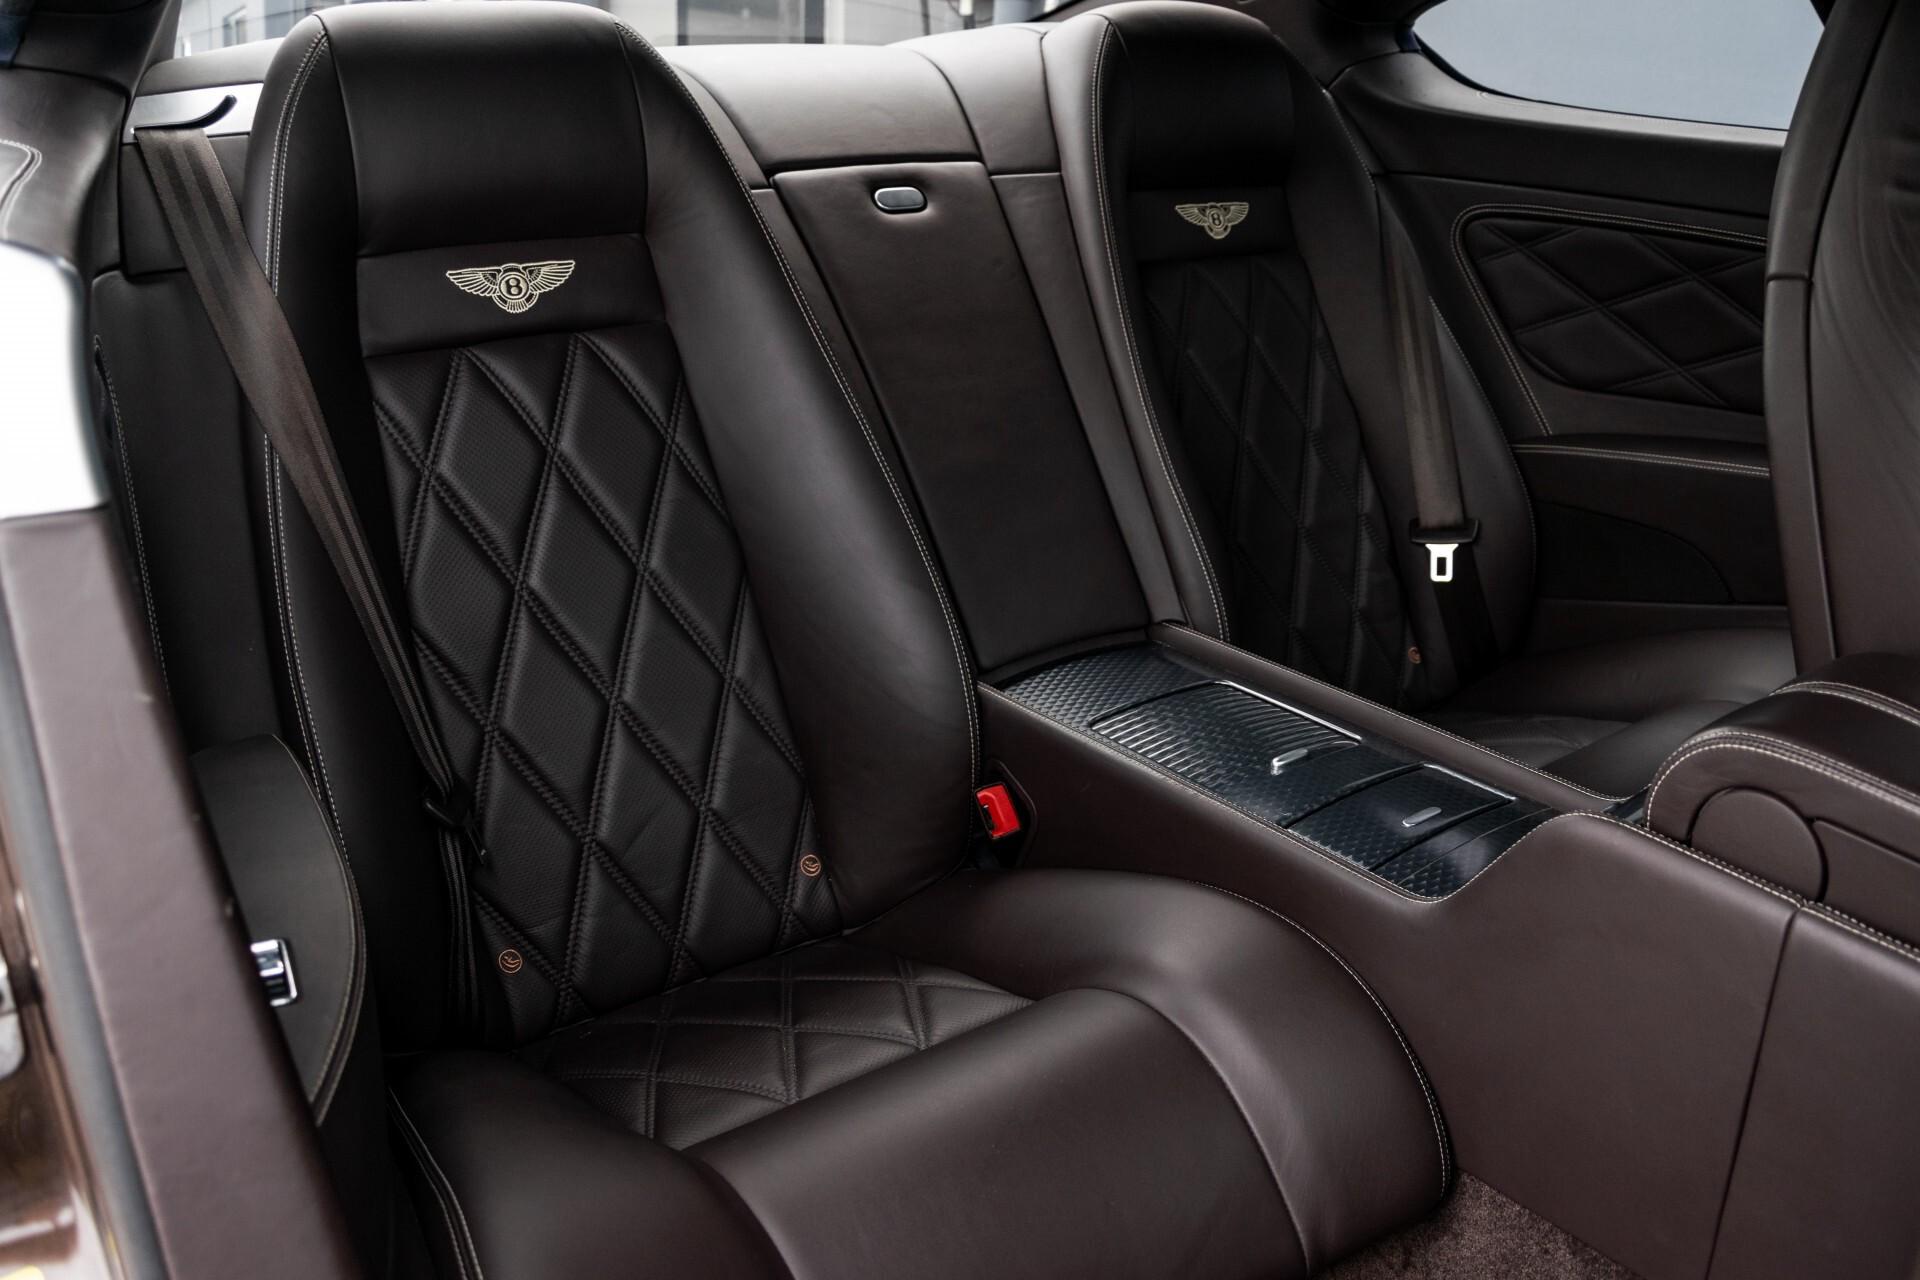 Bentley Continental GT 6.0 W12 GT Speed Ceramic Brakes/Mulliner/Standkachel/Keyless Aut6 Foto 4